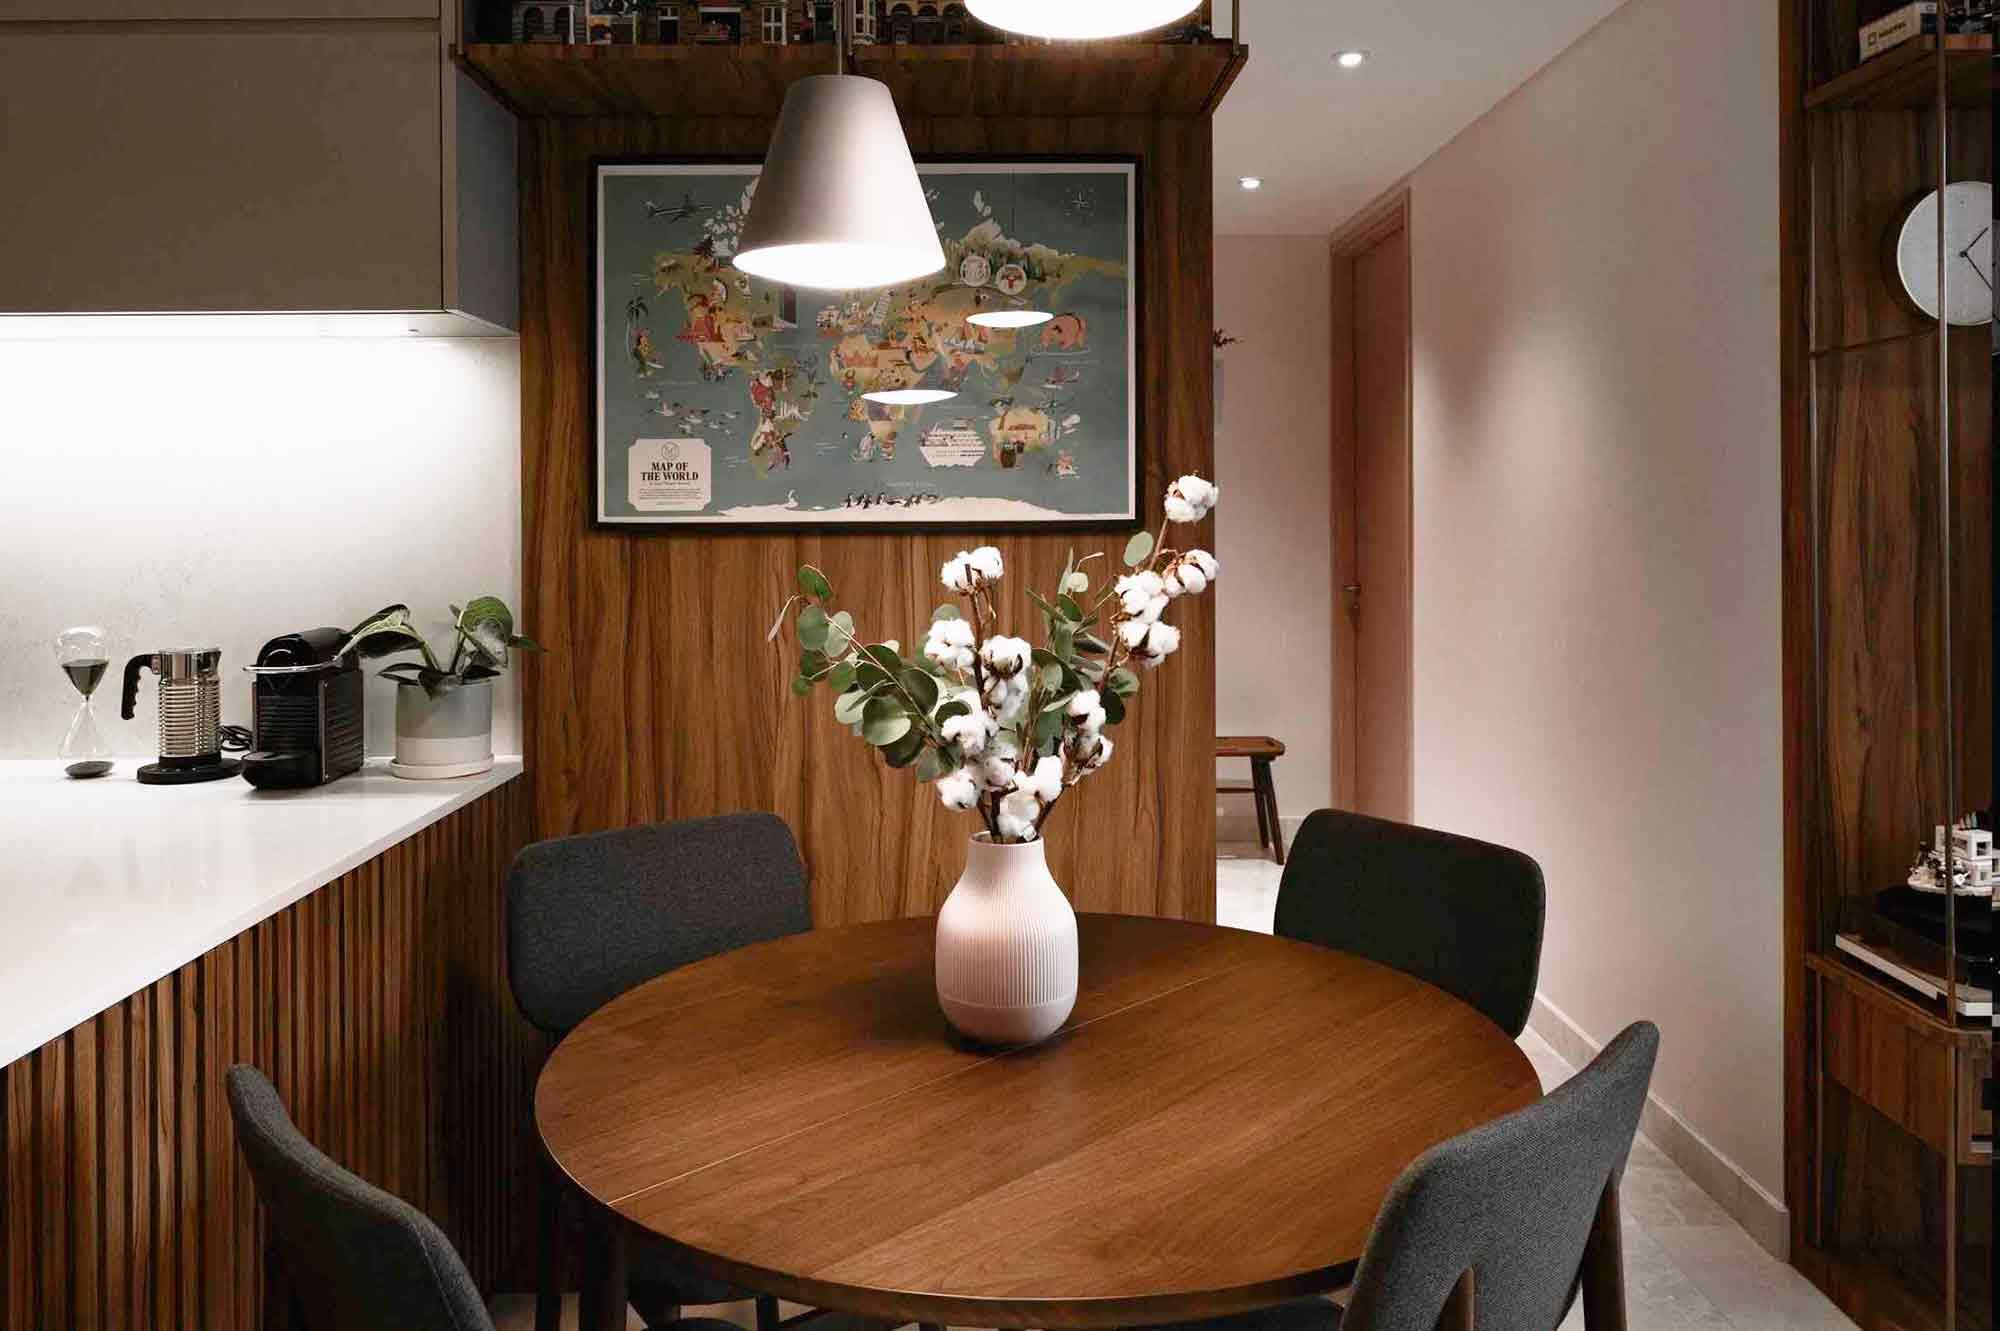 Ruang makan minimalis karya Helloembryo, via arsitag.com